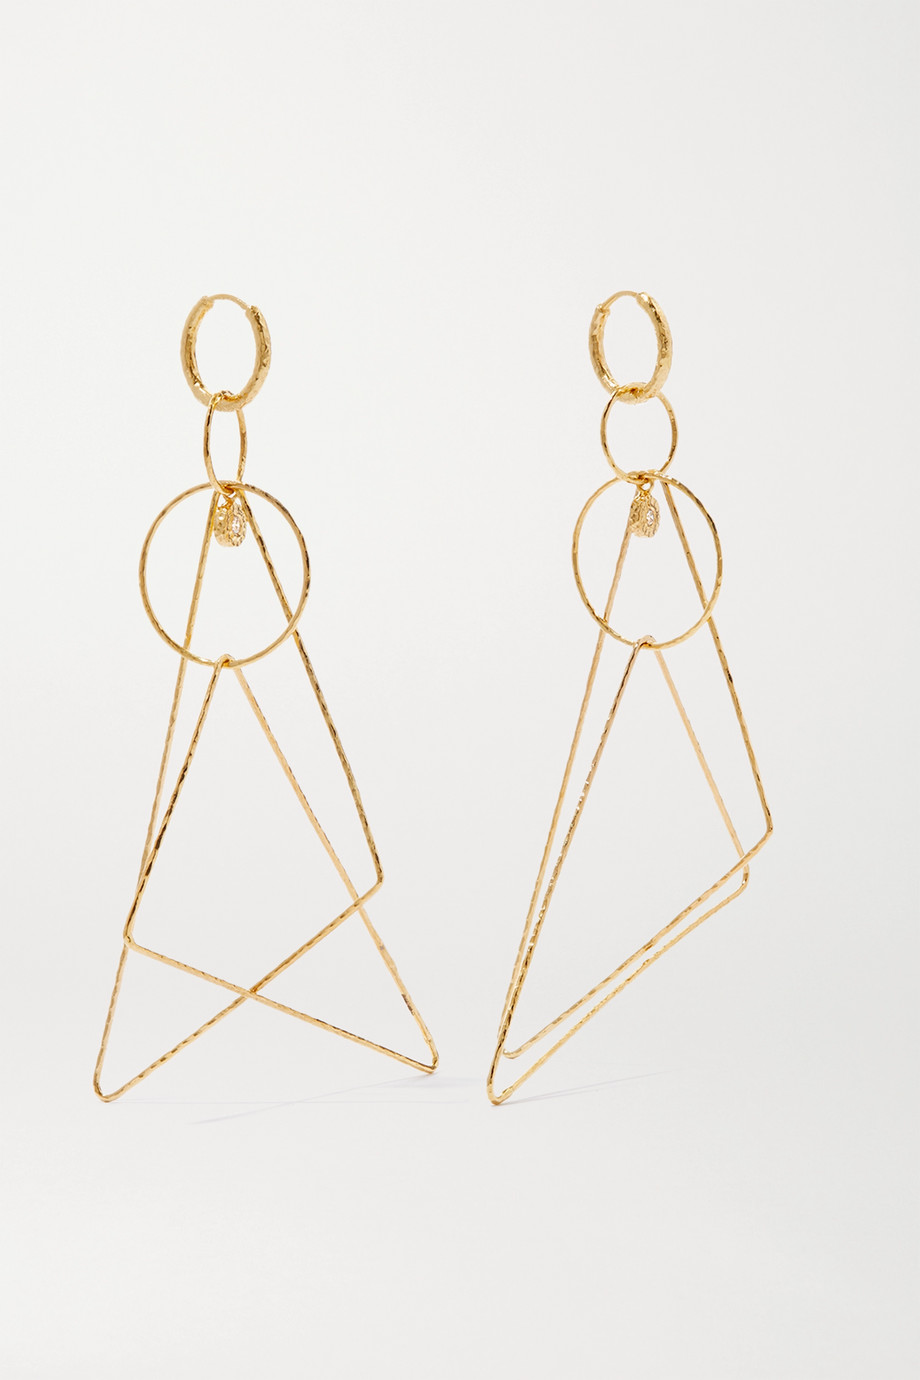 Octavia Elizabeth Whimsy 18-karat gold diamond earrings